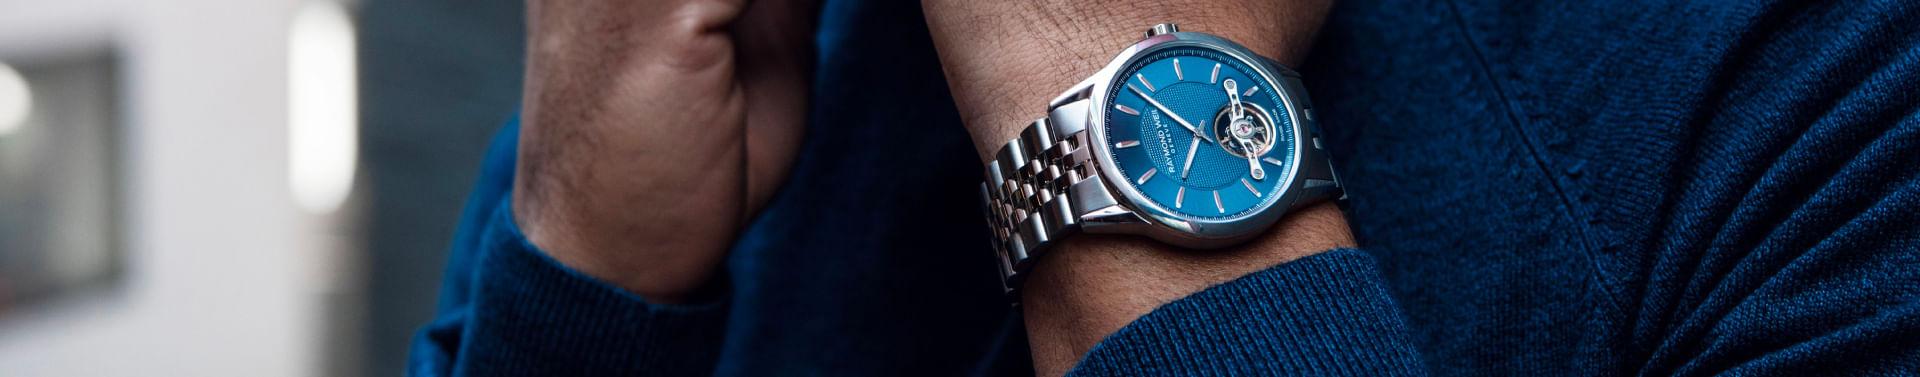 Relojería para Hombre